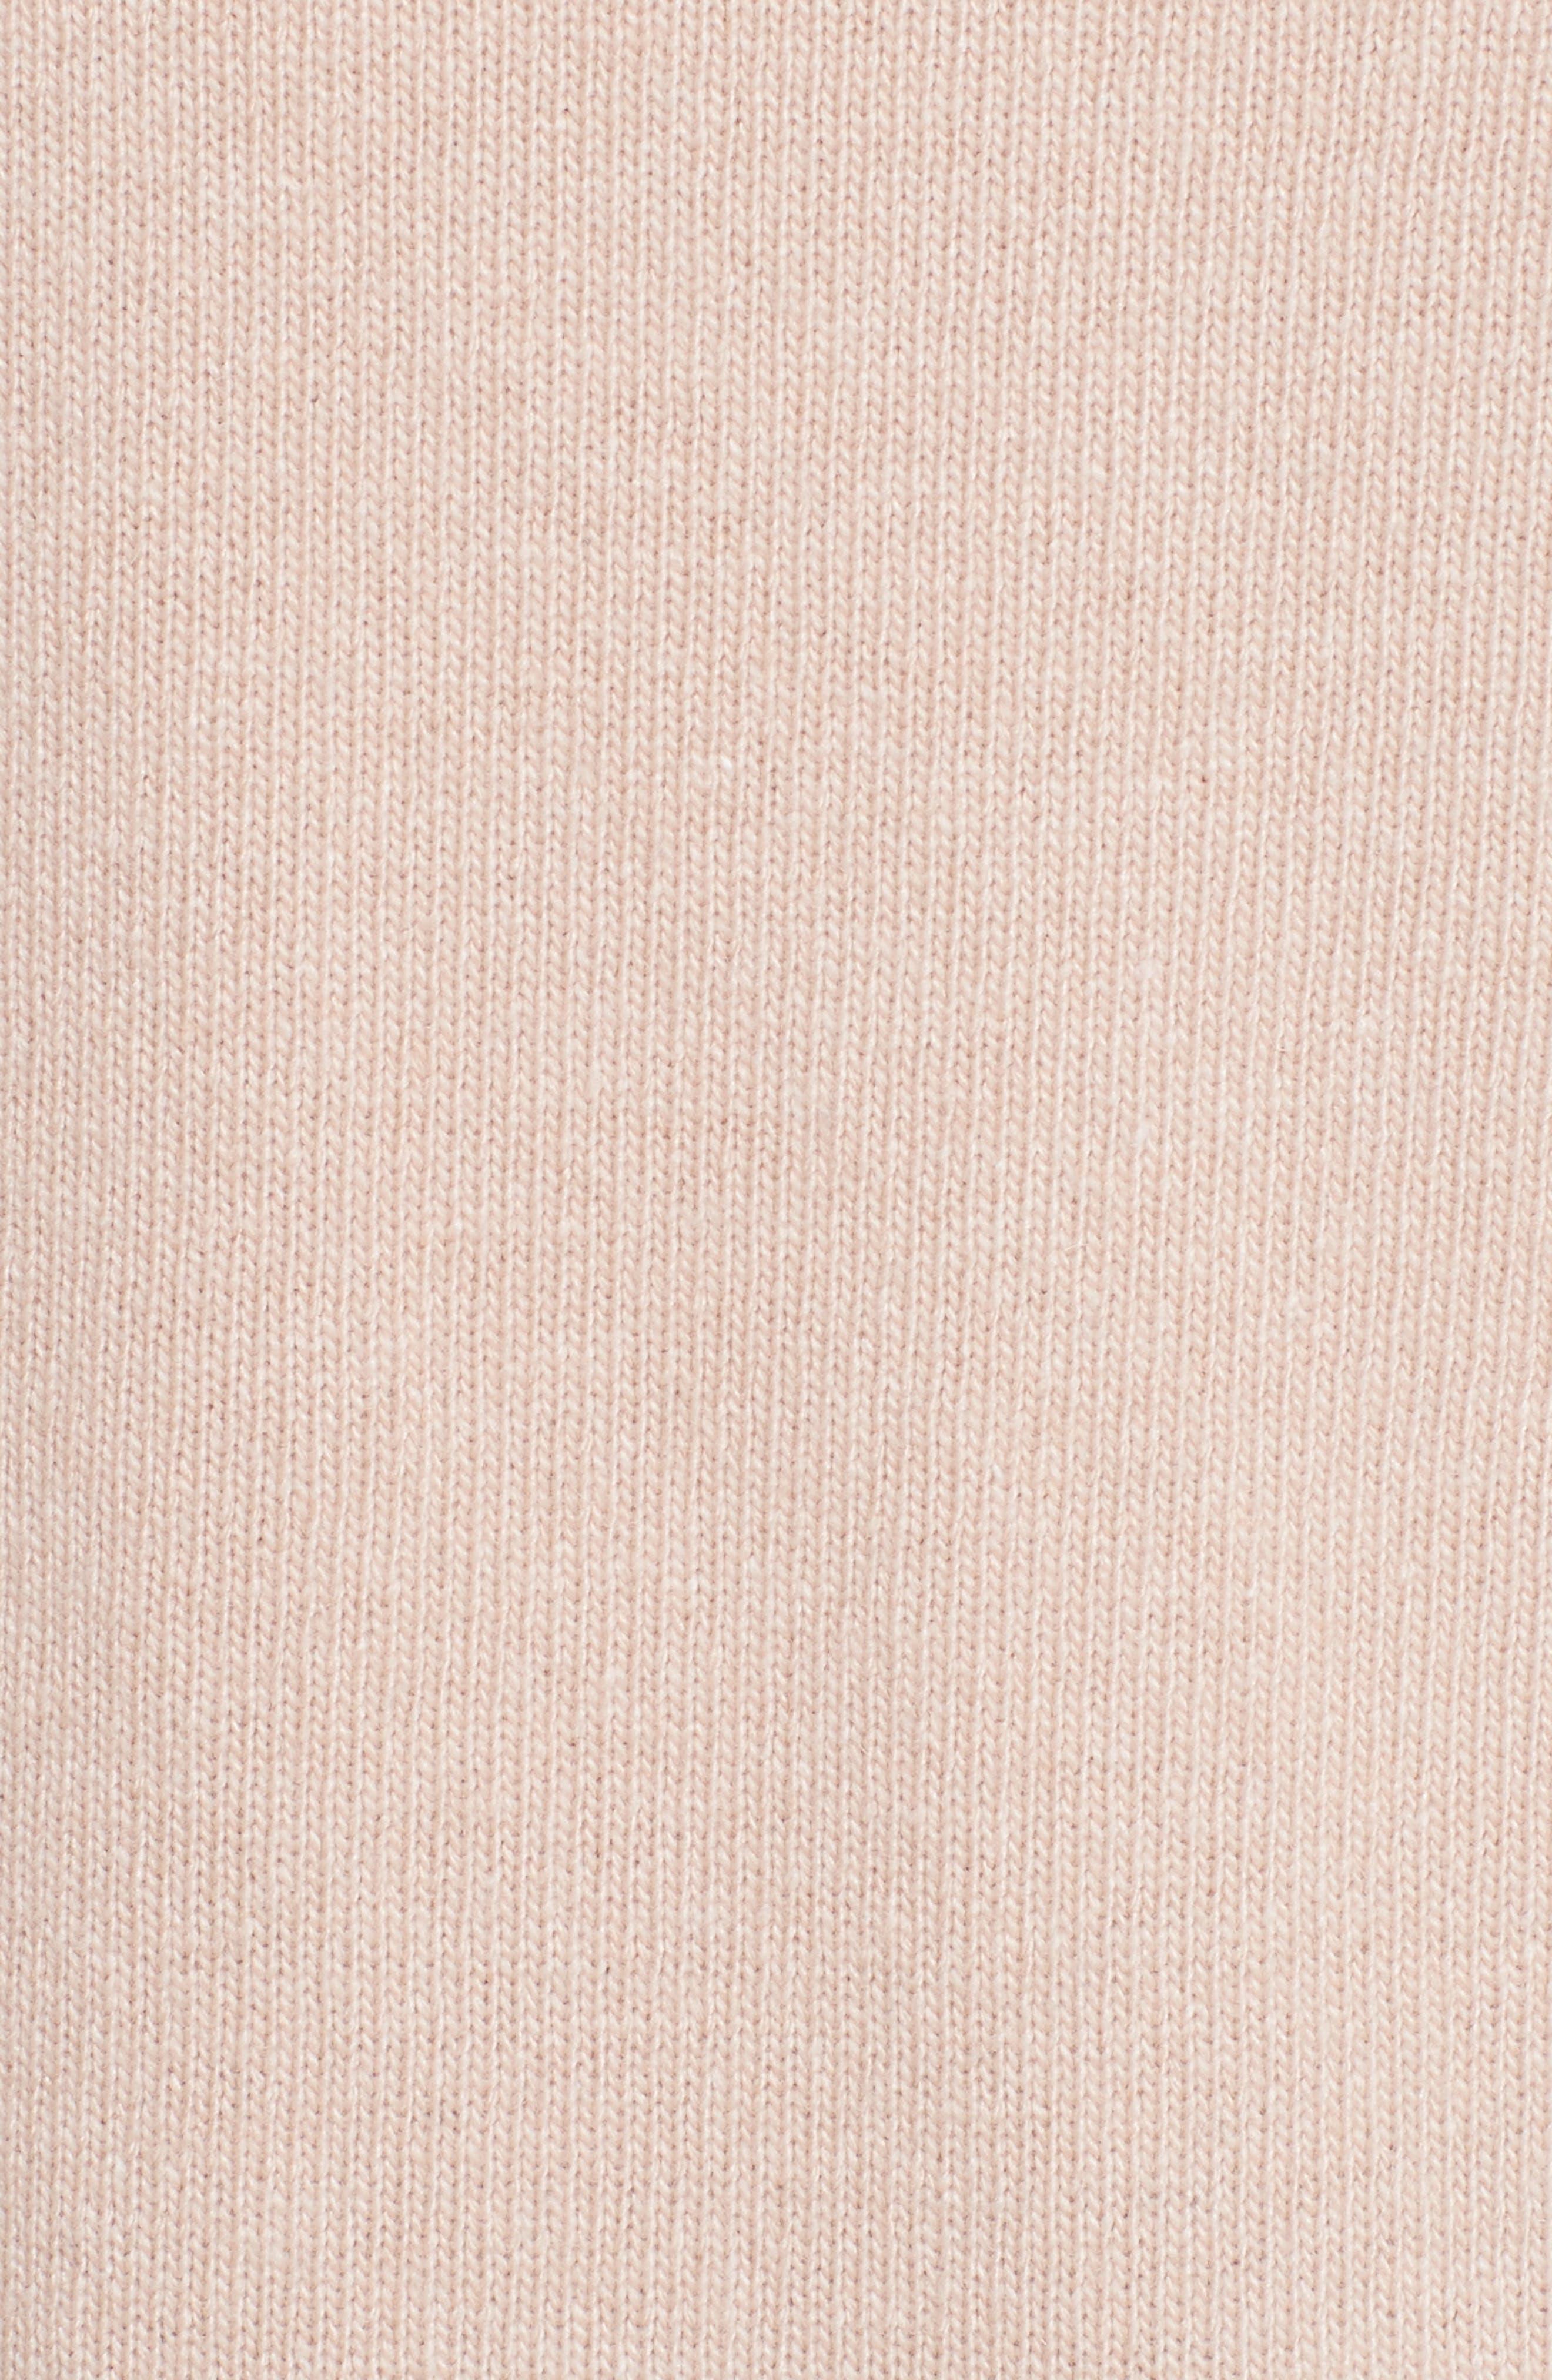 Clarette Bell Sleeve Sweater,                             Alternate thumbnail 5, color,                             650